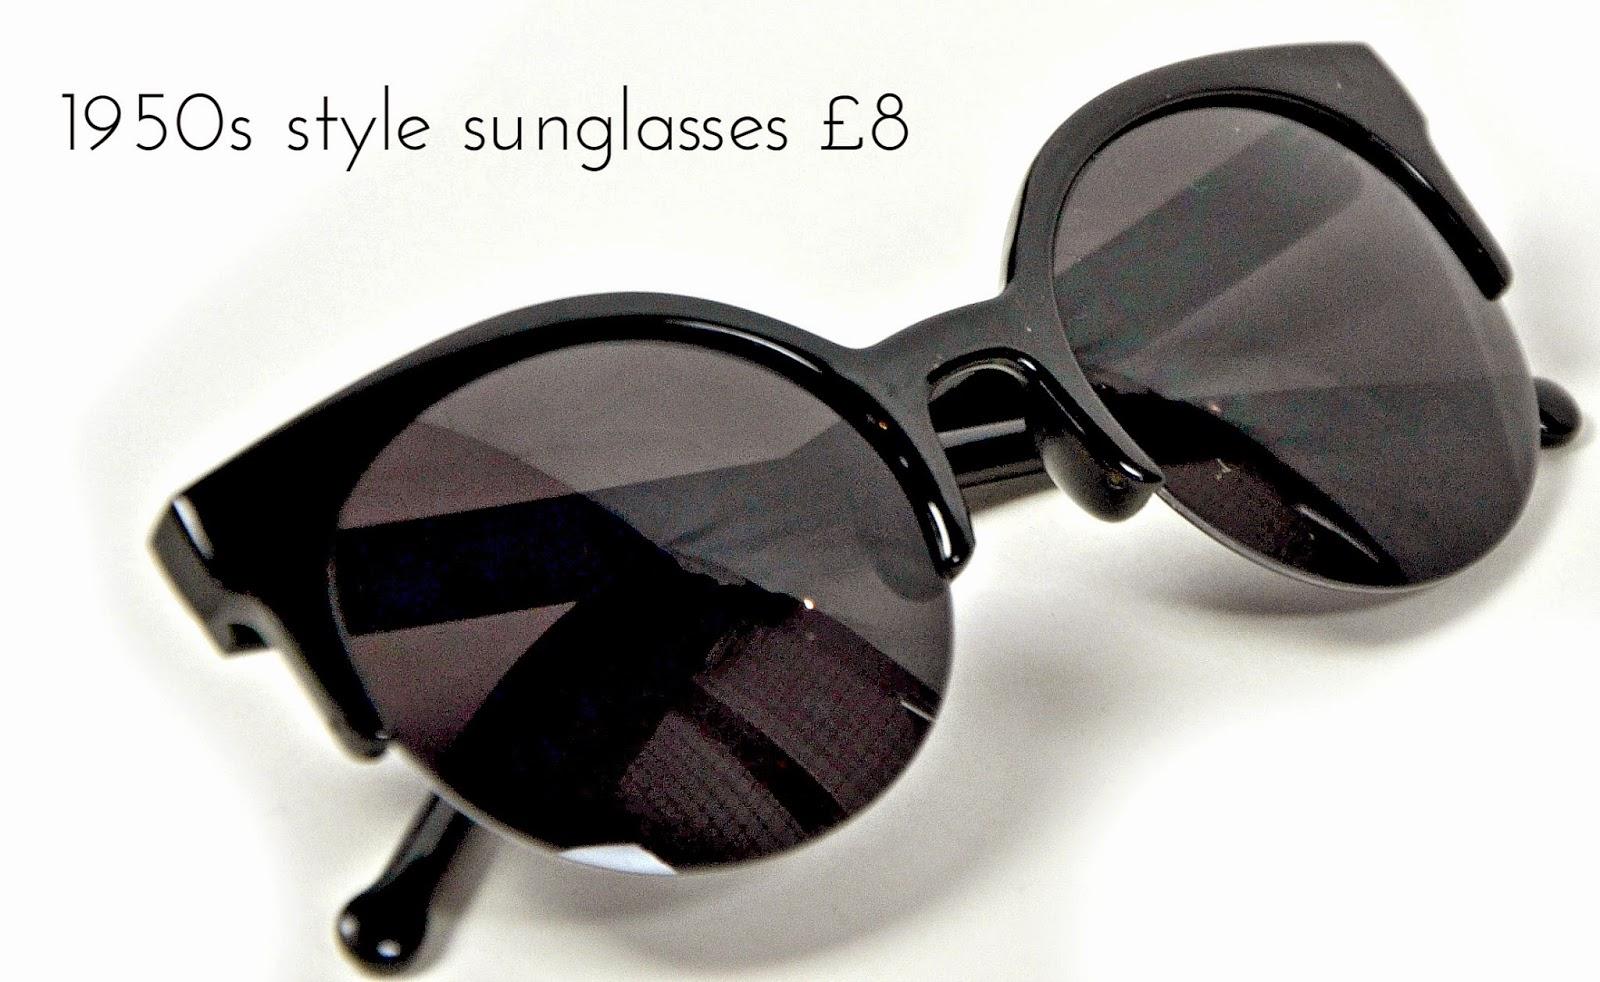 ac10993dc36 Lesley s Girls- Vintage Lifestyle and Fashion Blog  Sunglasses hide ...